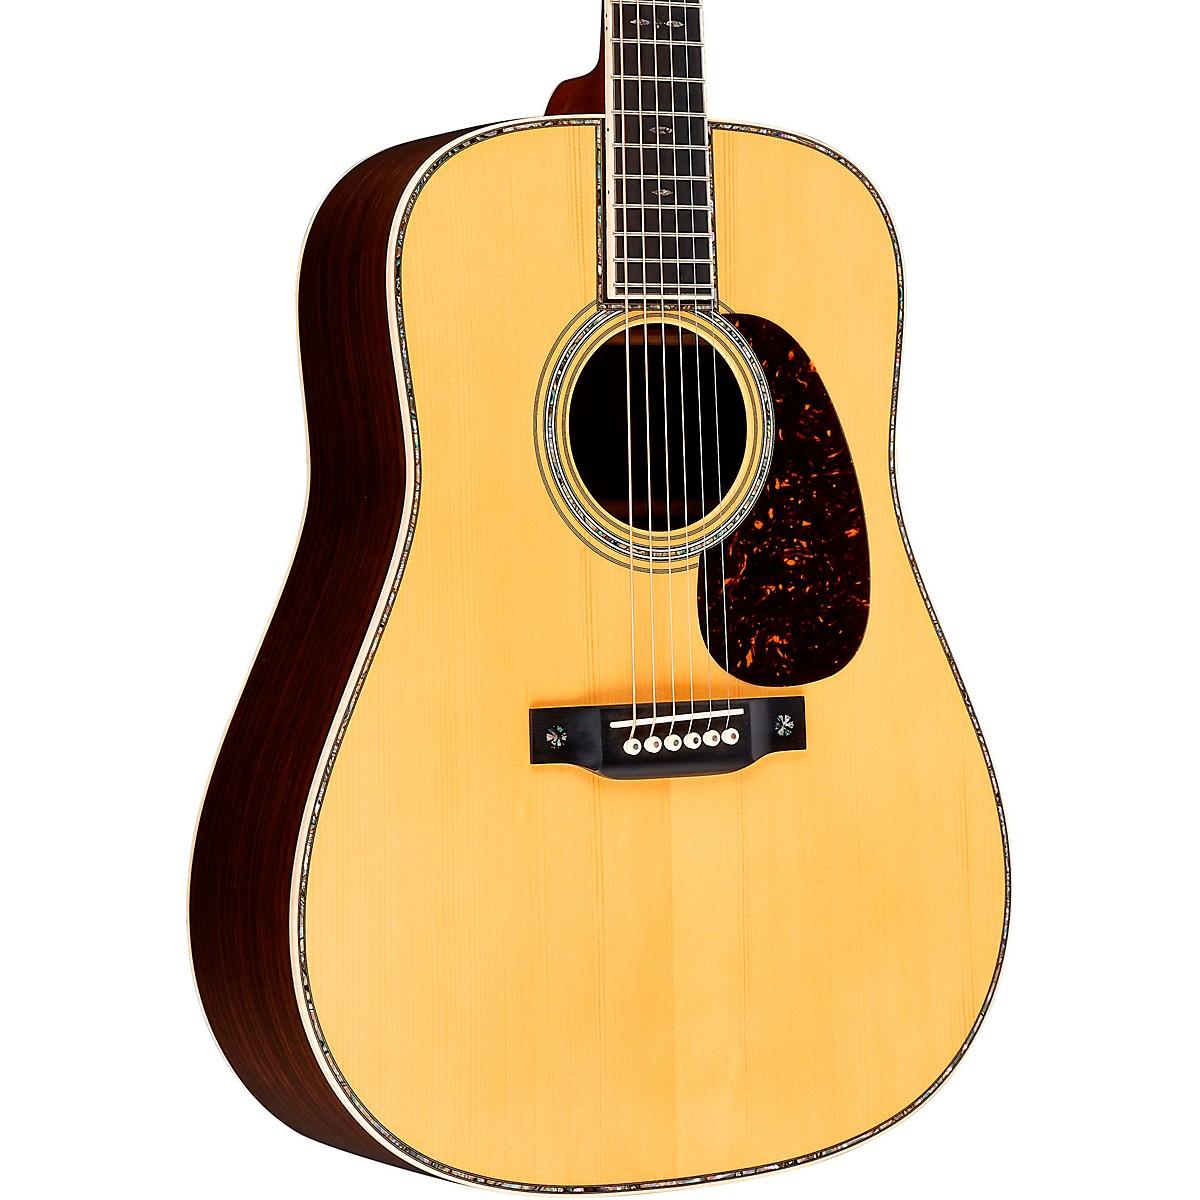 Martin D-42 Custom Dreadnought Acoustic Guitar